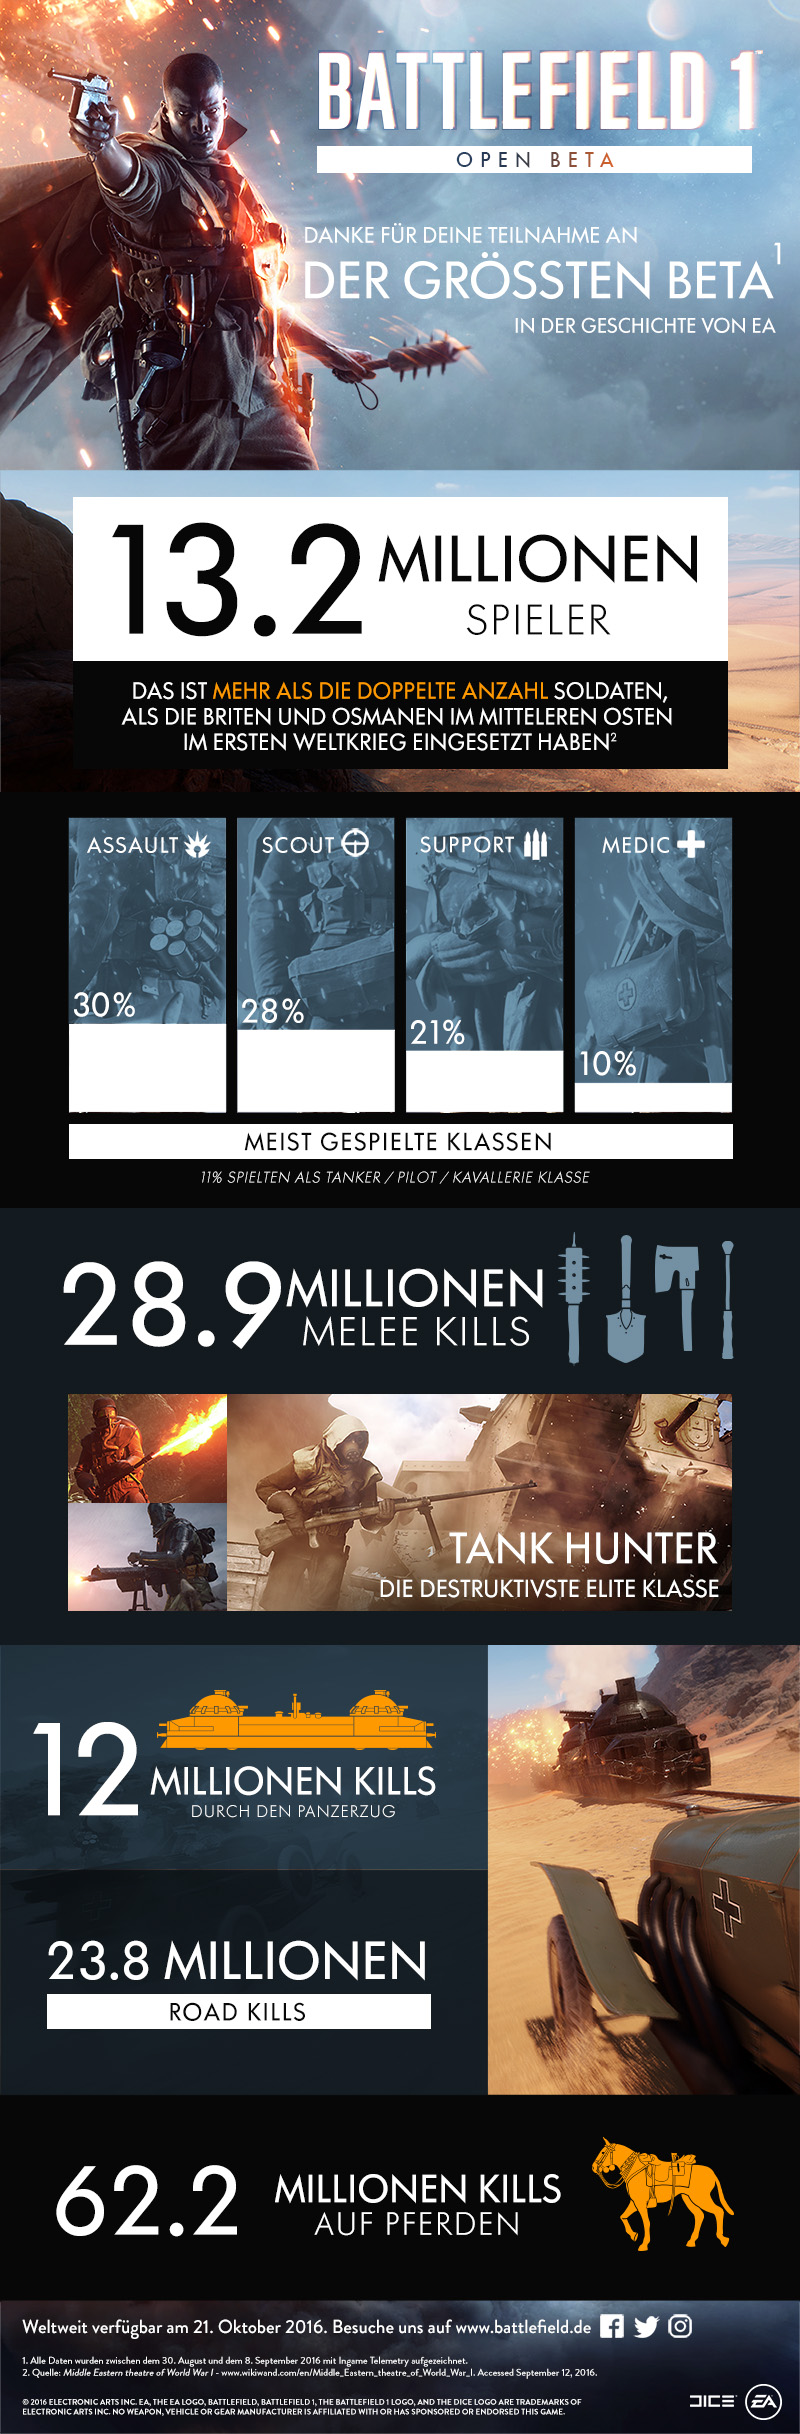 battlefield1_infografik_beta